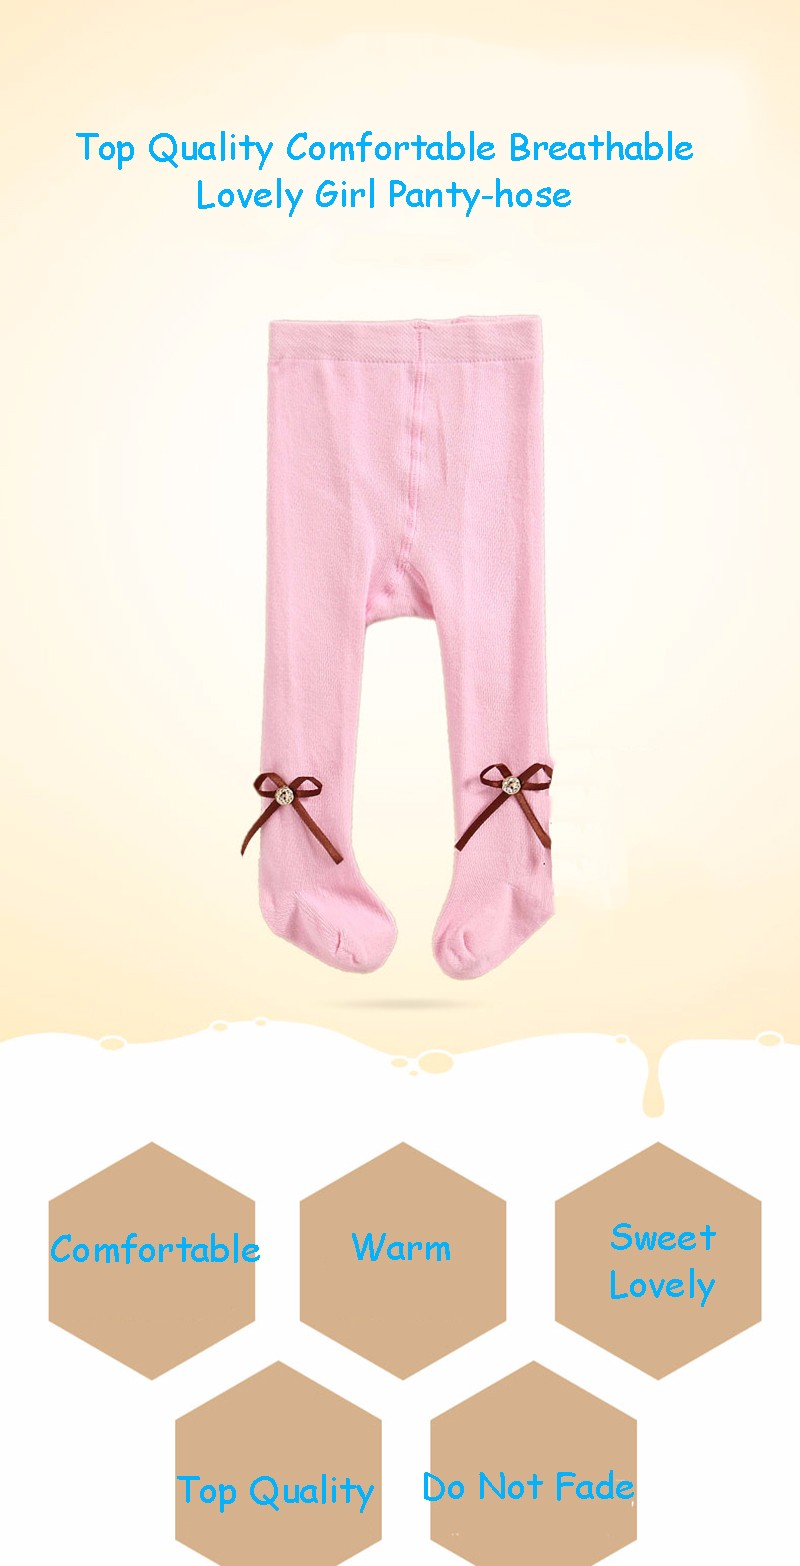 Girl Panty-hose (1)